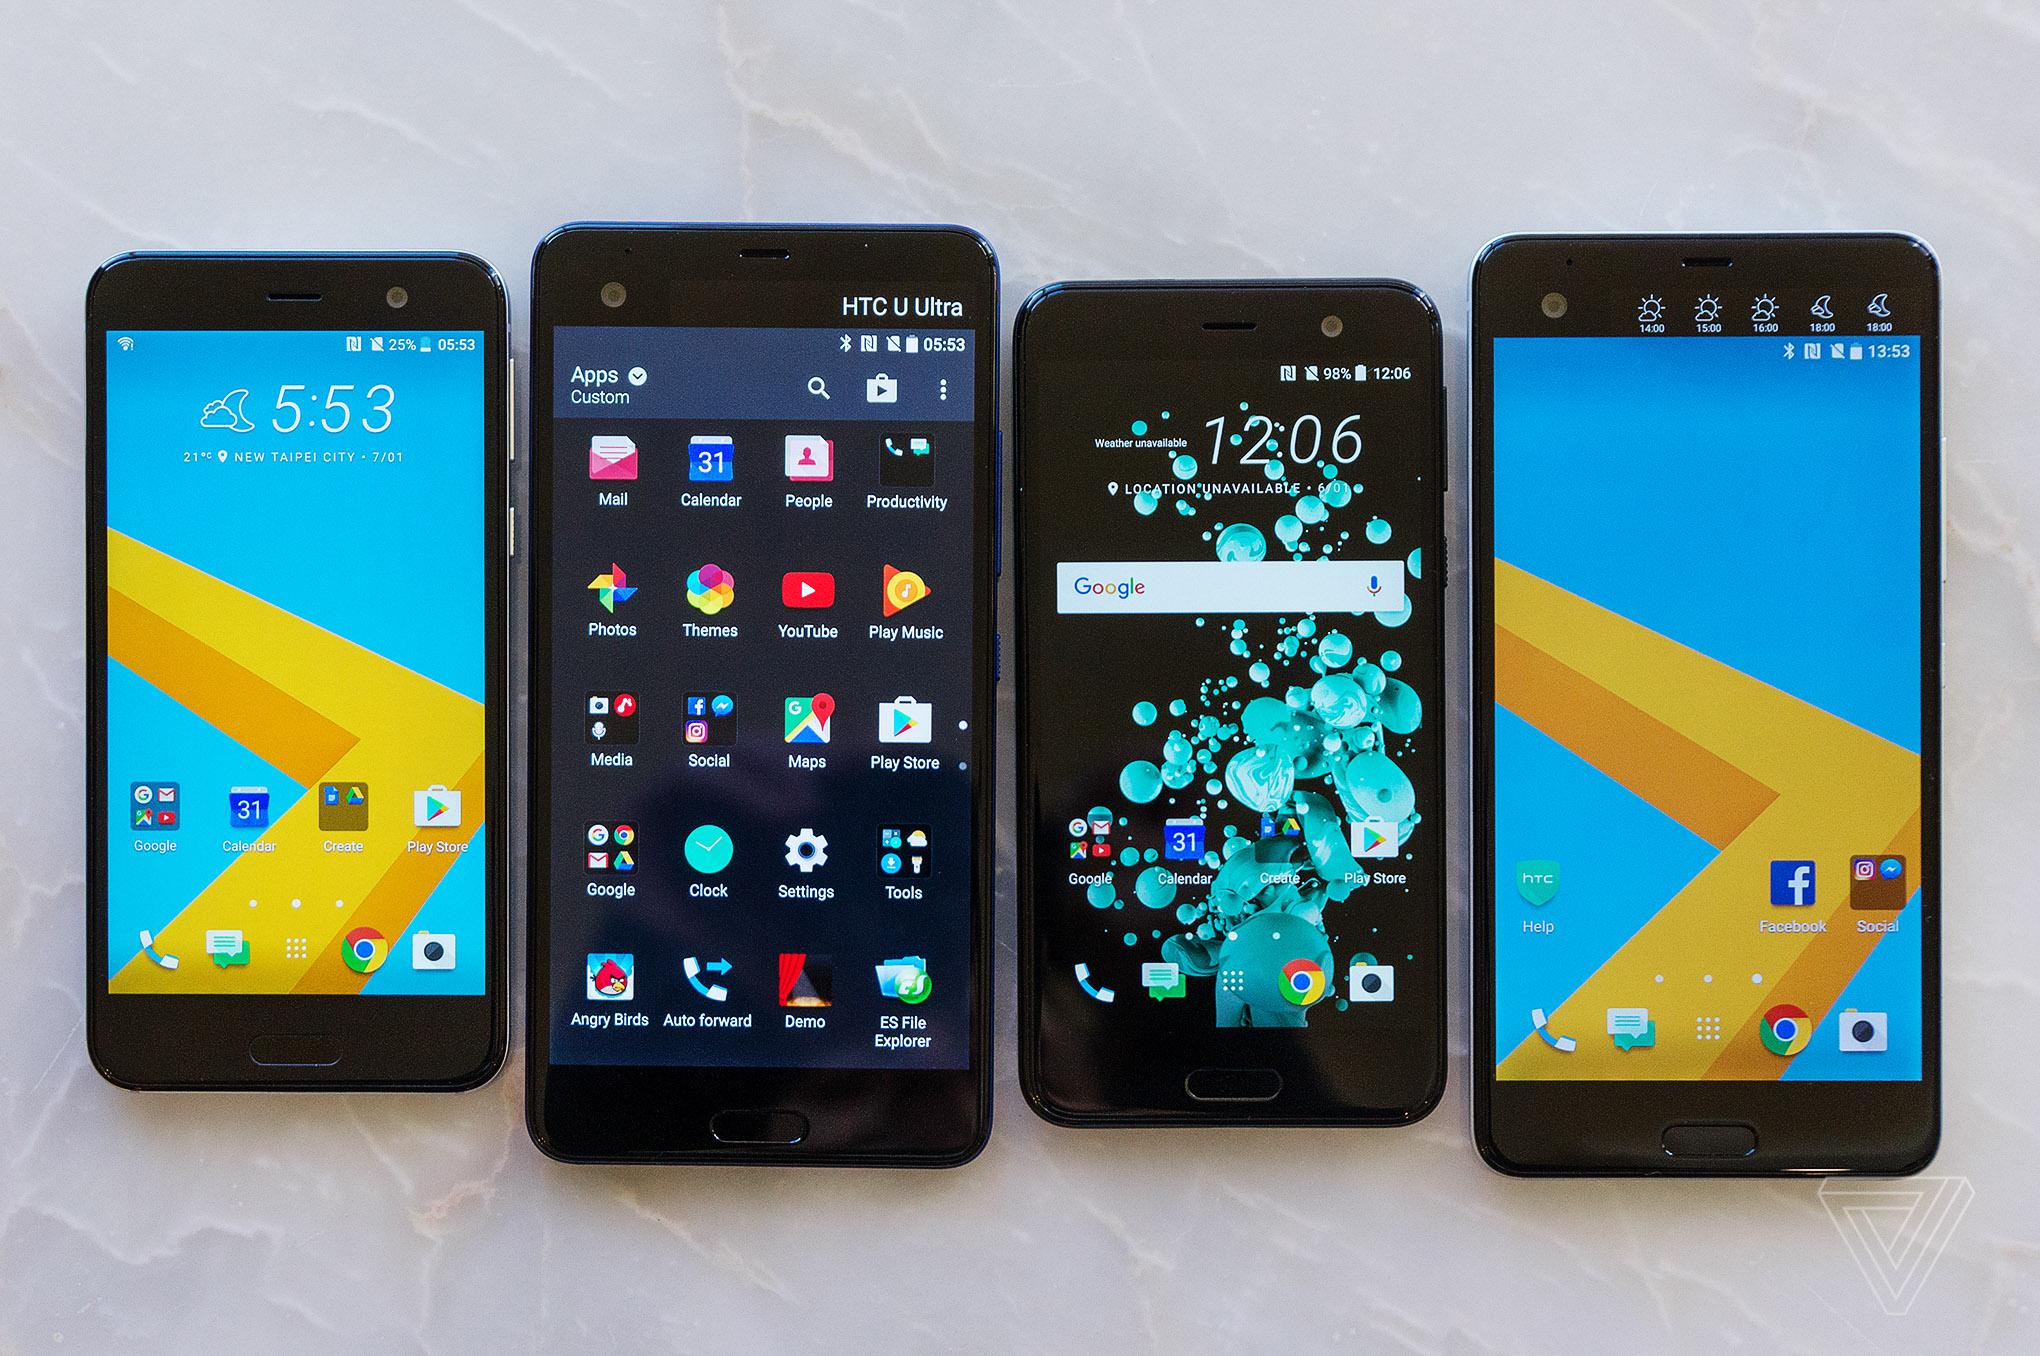 HTC's U Play and U Ultra